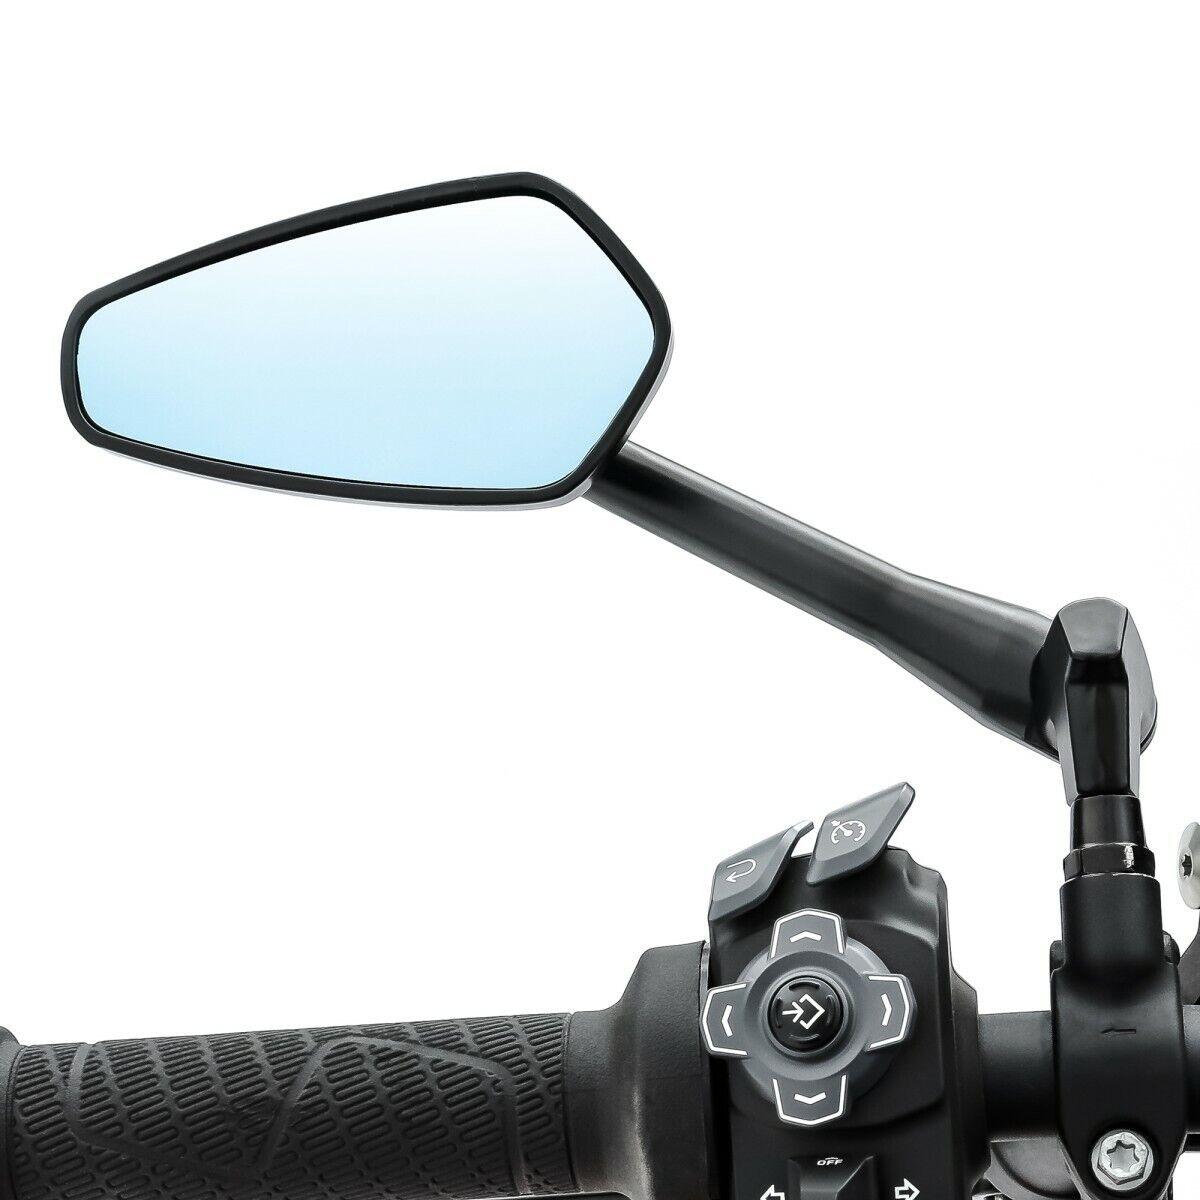 SP black Rear View Mirror XR1 for Ducati Hypermotard 939//950